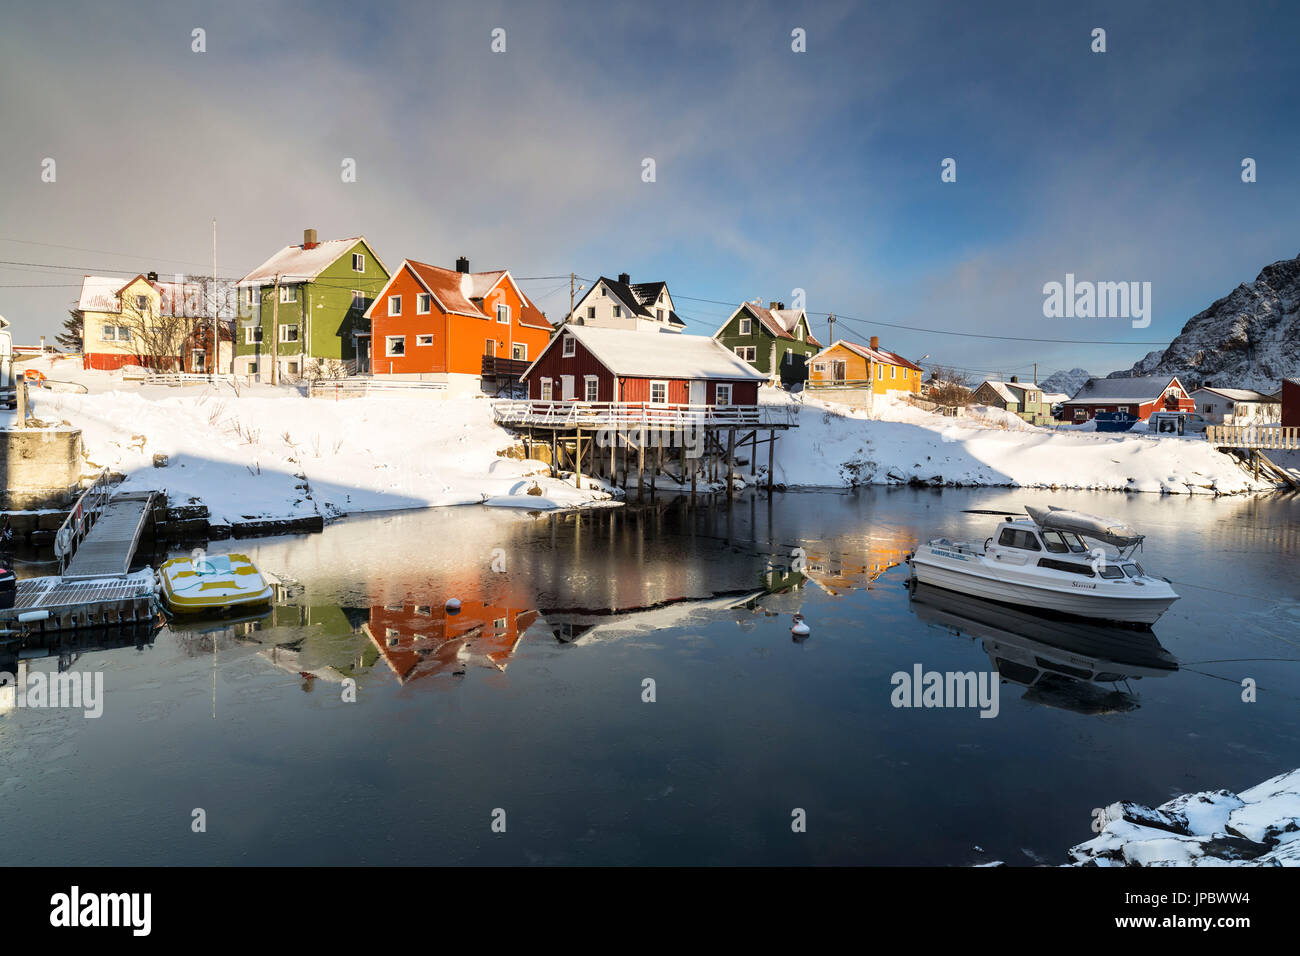 Colourful Houses in snow, Henningsvær Fishing village, Lofoten, Norway - Stock Image